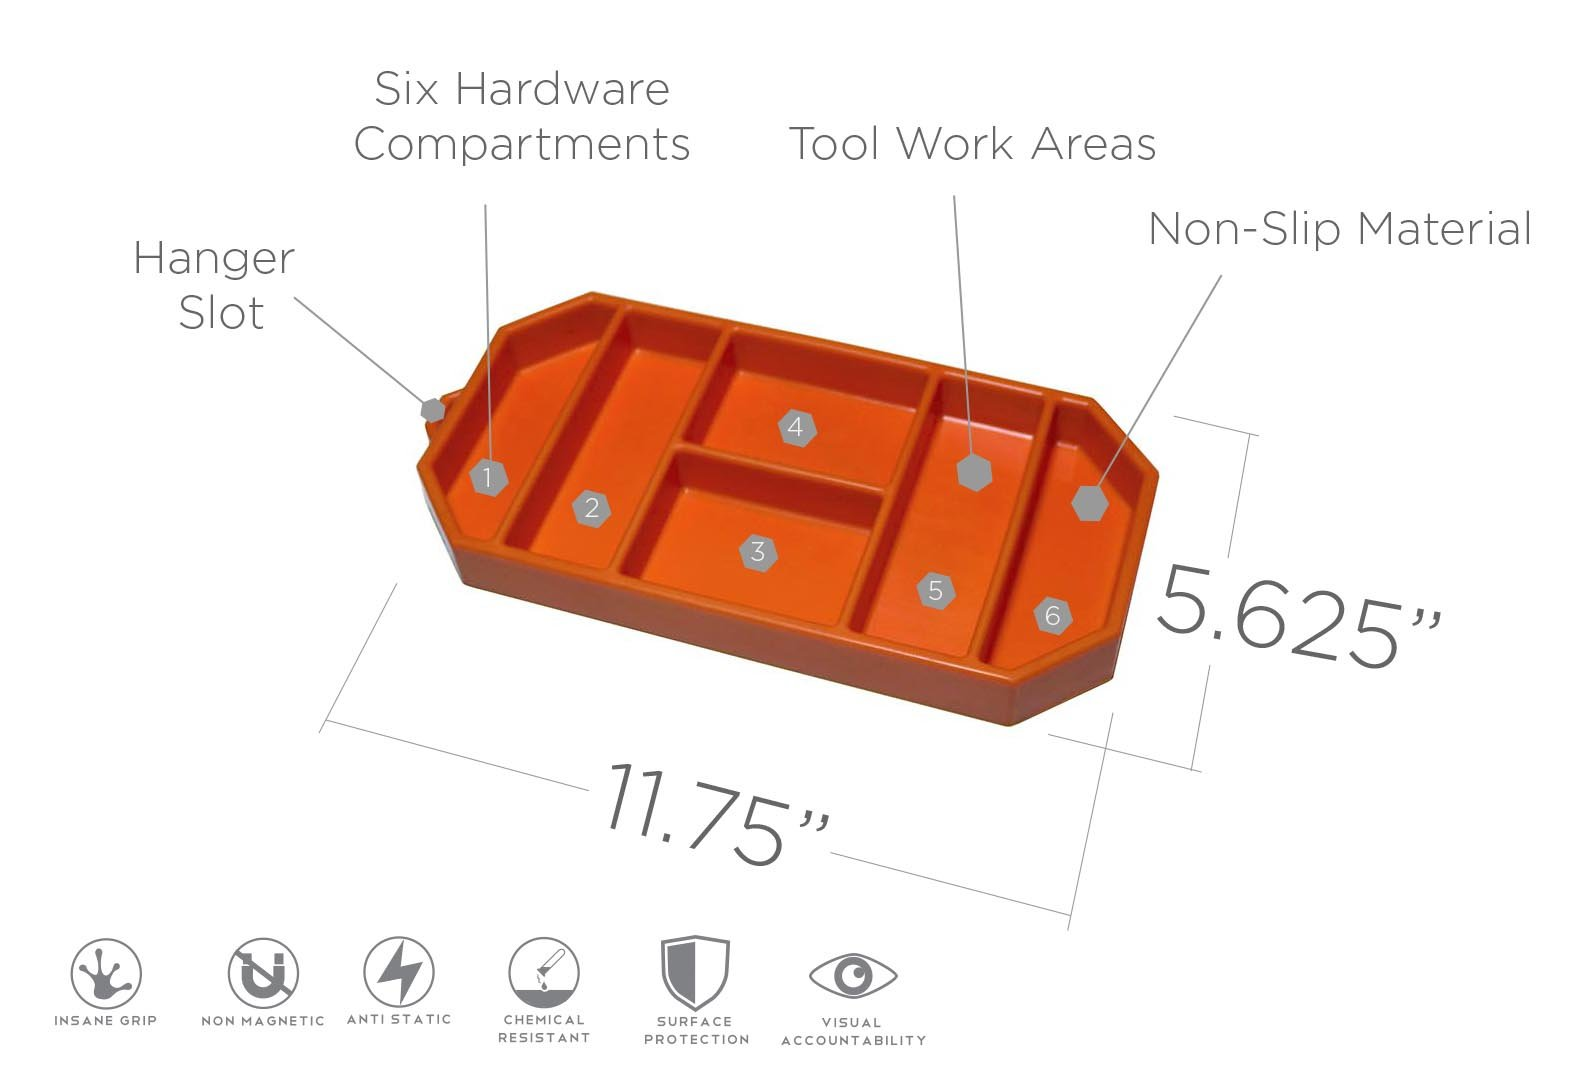 Grypmat | Non-Slip Flexible Orange Tool Tray | Tool Box Organizer | Socket Organizer | Tool Holder | Tool Mats | No Magnets | Easy Clean Up | As Seen On Shark Tank (Small) by Grypshon (Image #1)